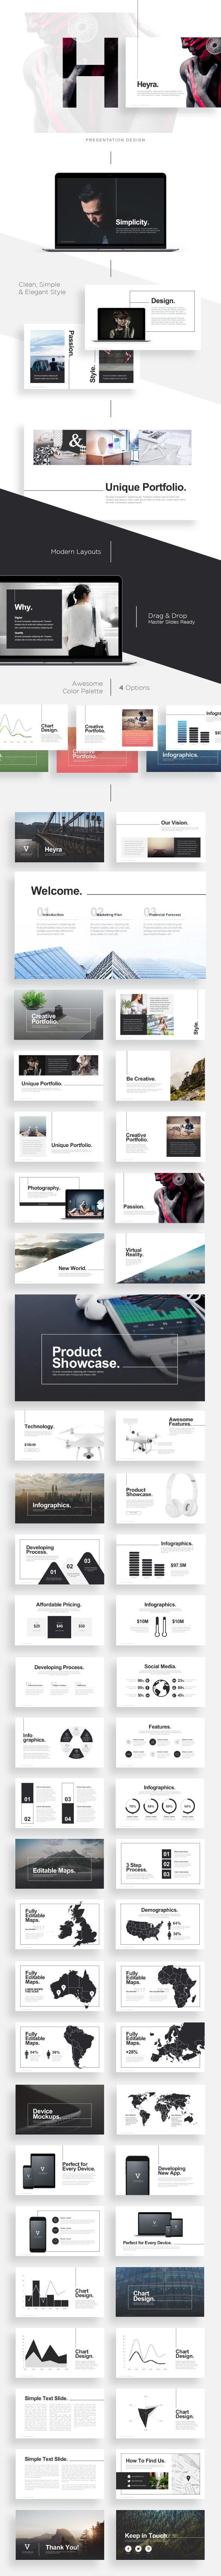 Heyra Powerpoint Template - PowerPoint Templates Presentation Templates